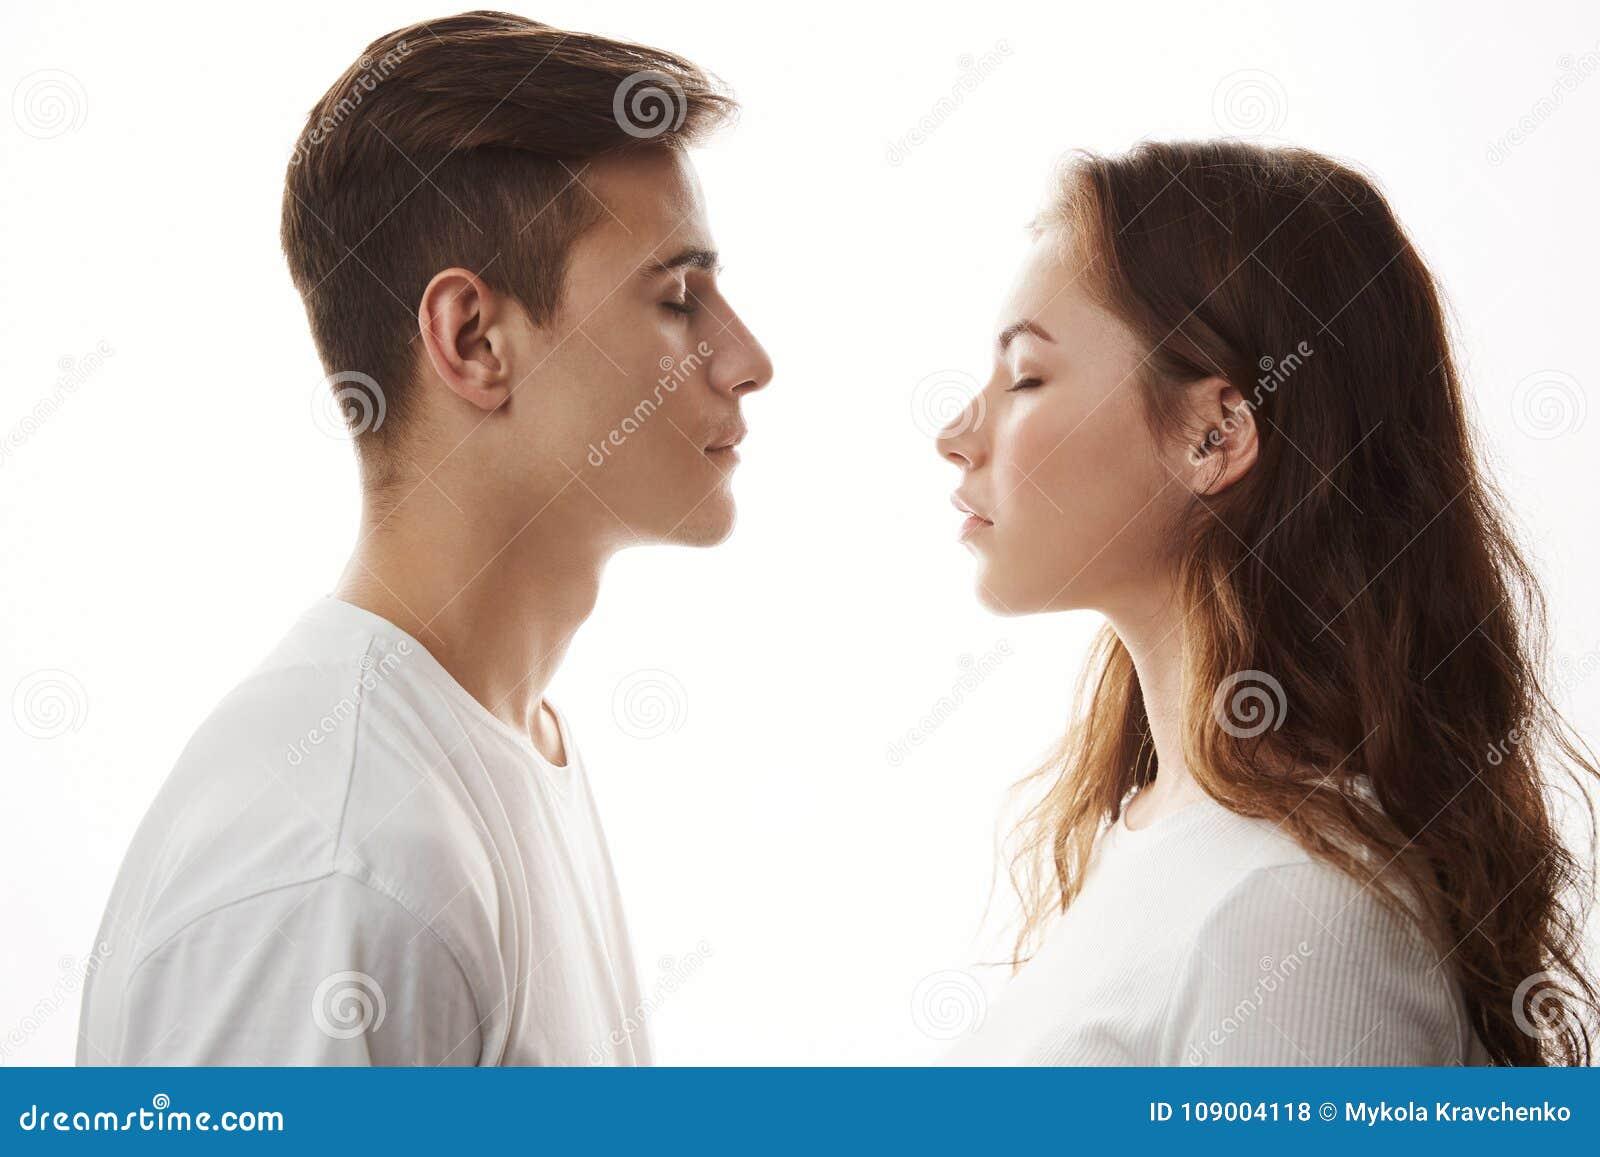 Dating up ragazzo amore incontri reality show